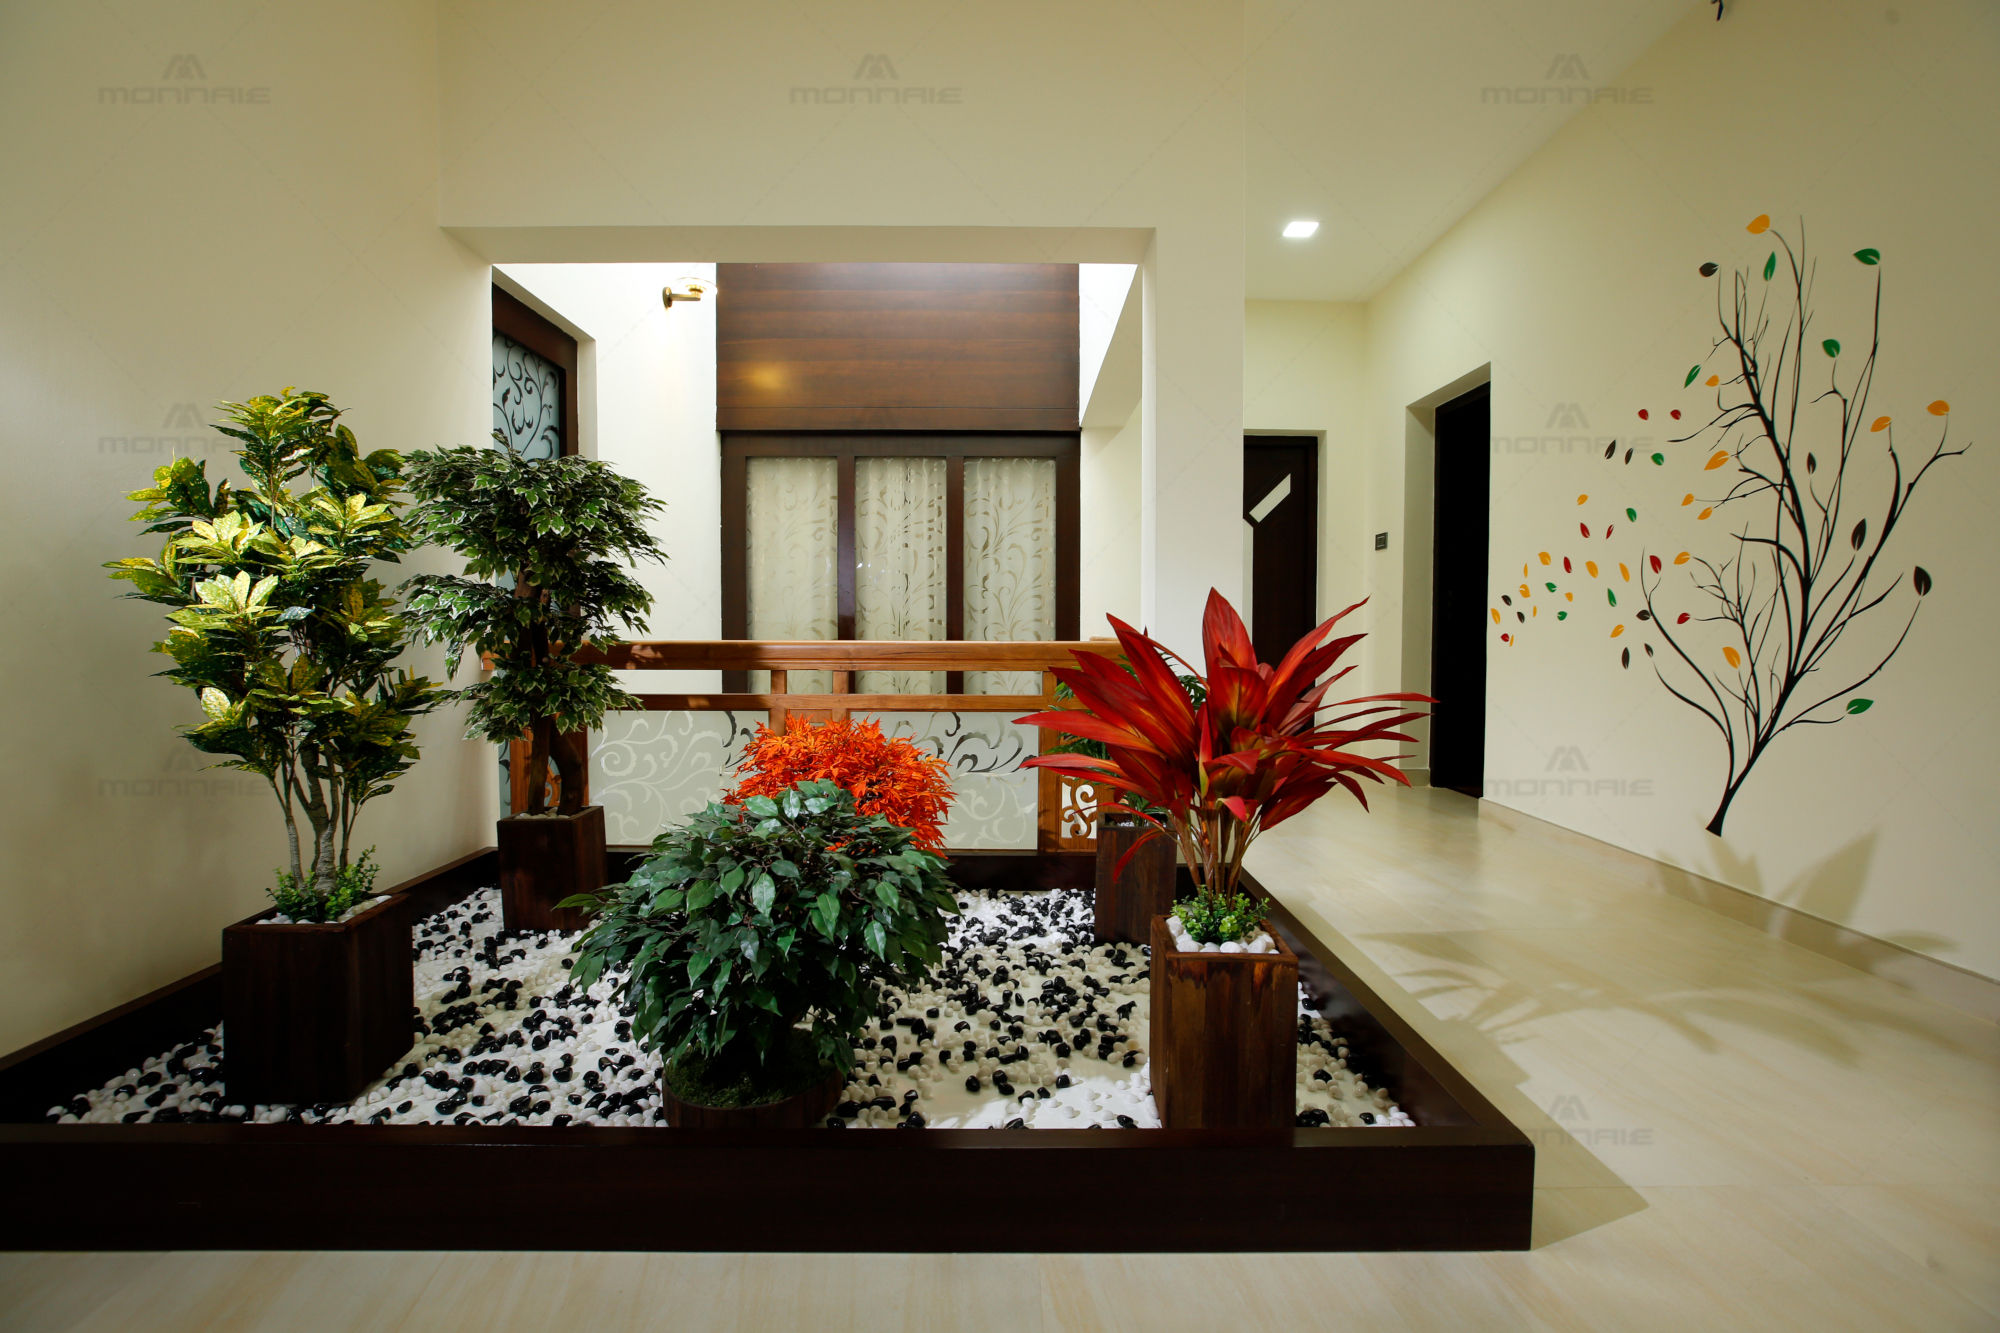 Contemporary Home Interior Designers Kochi Monnaie Architects Interiors Media Photos And Videos 3 Archello